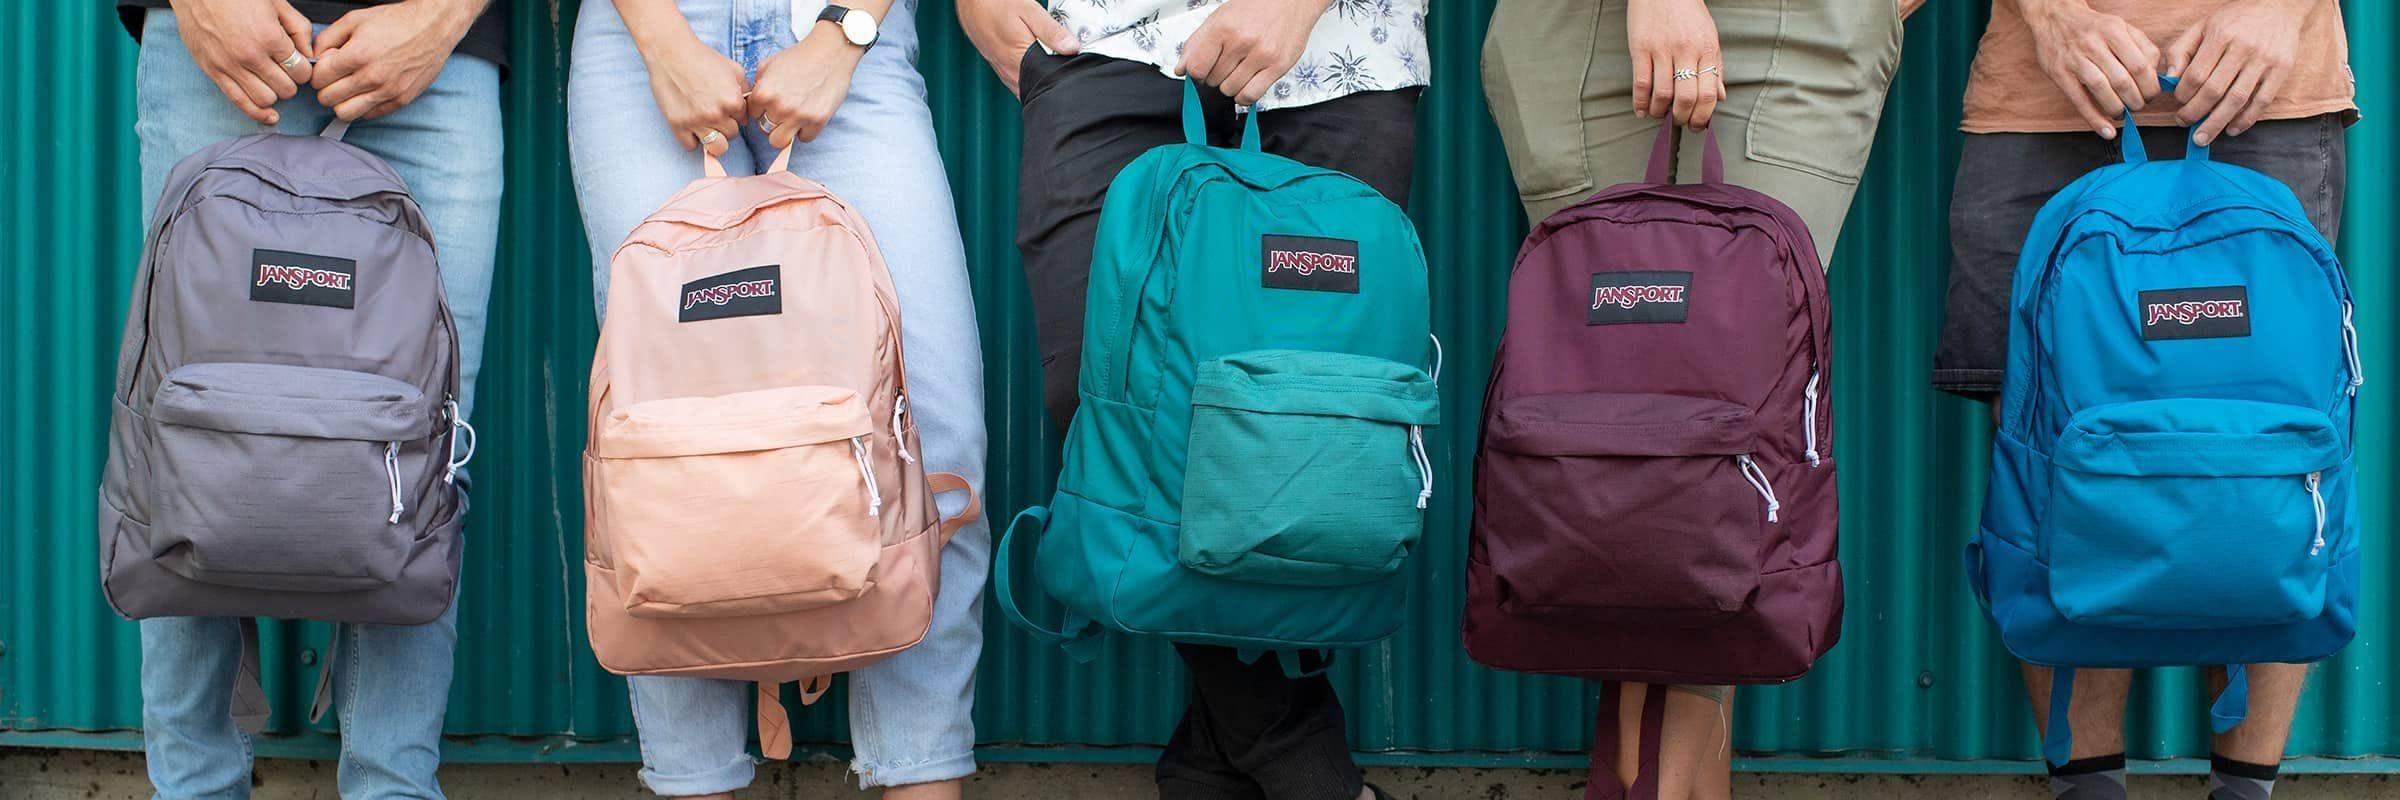 Burton, Dakine, Fjällräven, Herschel Supply Co., JanSport, Sandqvist, Topo Designs. How To Choose The Right School Bag Or Backpack